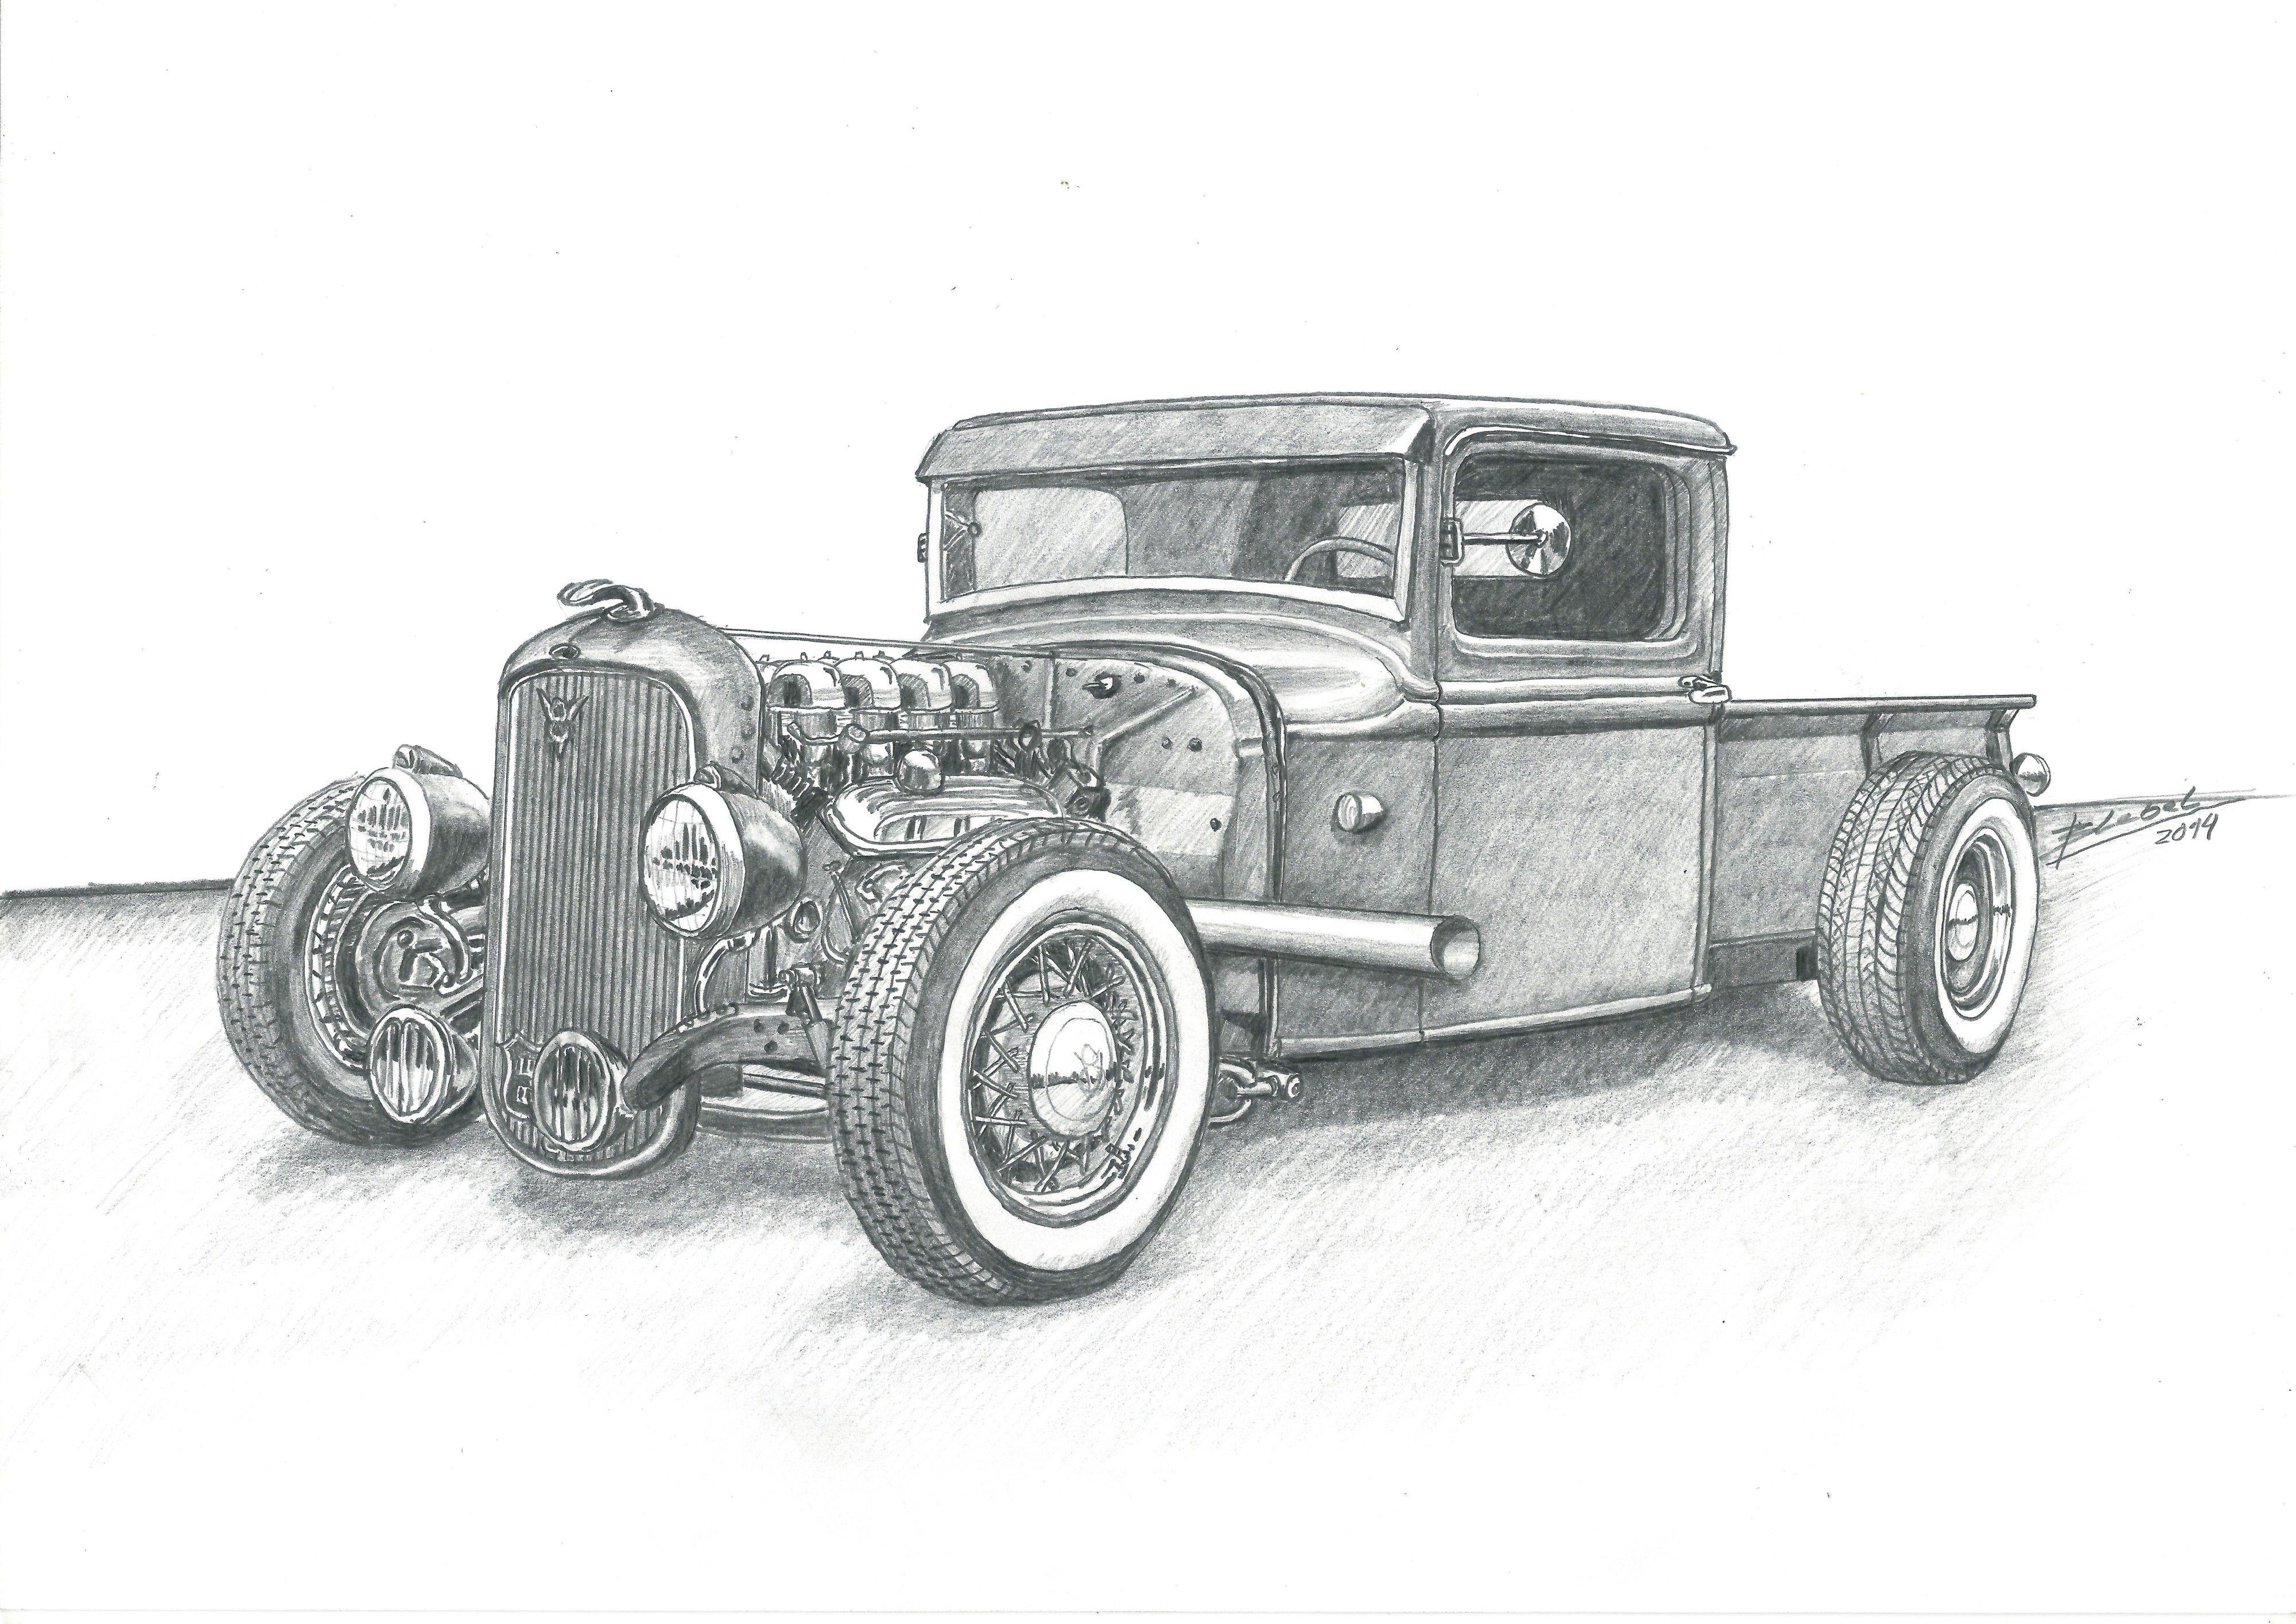 Titulo Bring It On Home Pickup Ford Rat Rod Tecnica Lapiz Grafito Sobre Papel Dimensiones 29 7 Cm X 21 Cm Autor Dibujos De Coches Hot Rod Rat Rods